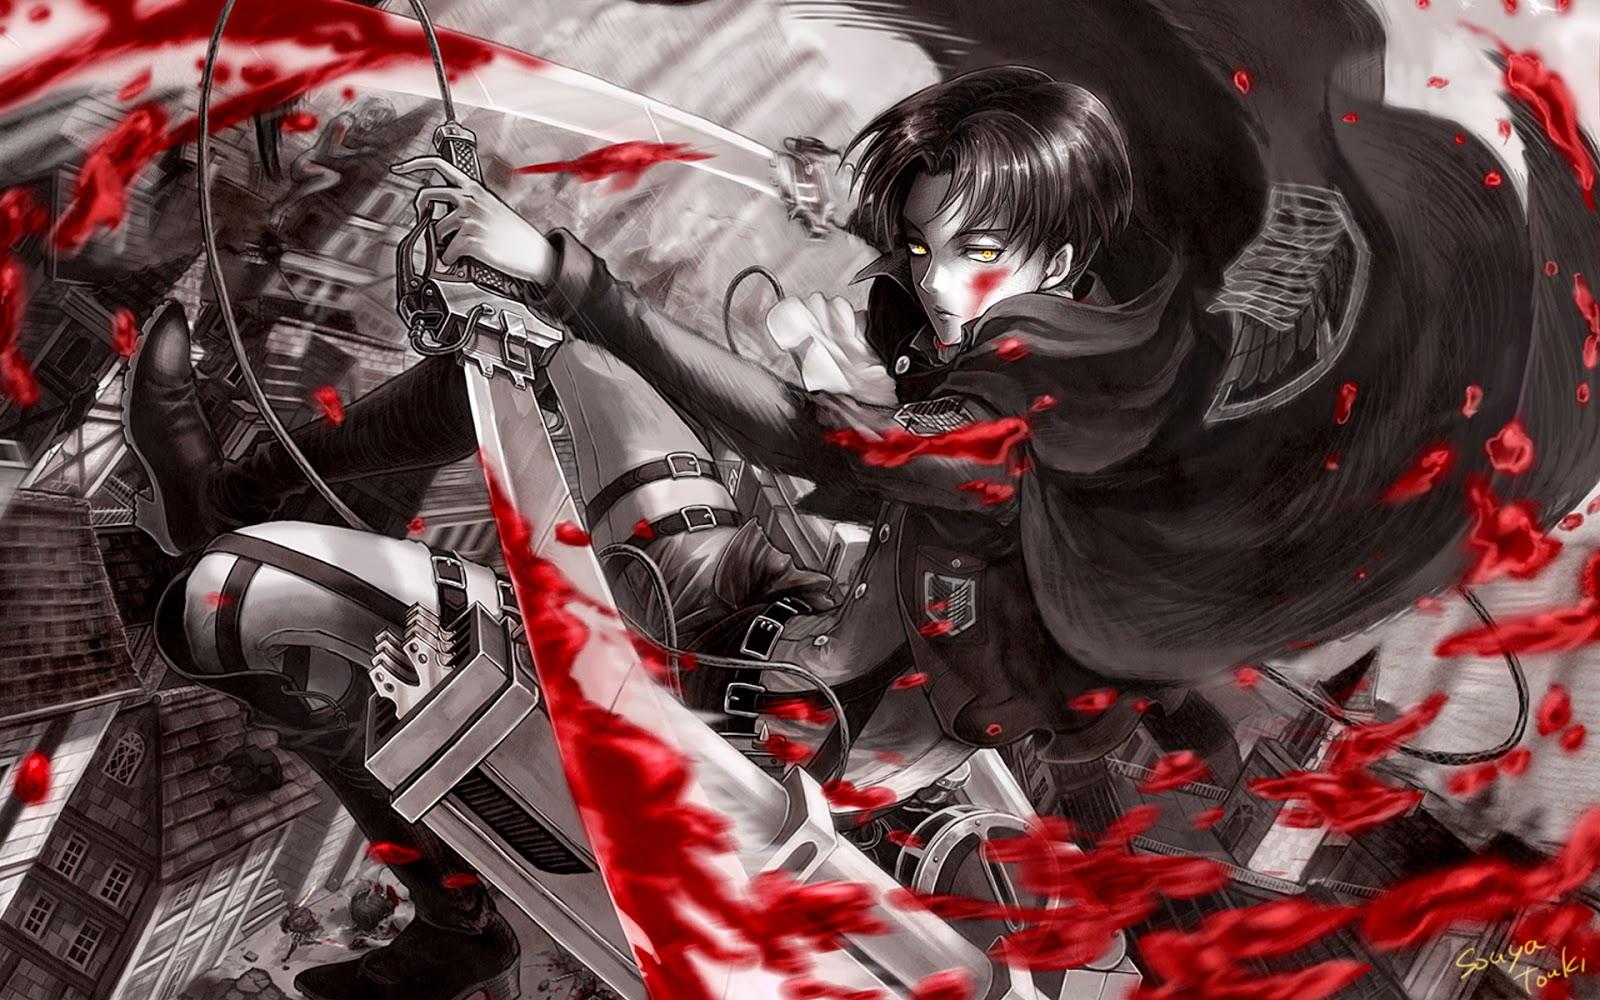 levi attack on titan picture hd wallpaper 1920x1200jpg 1600x1000